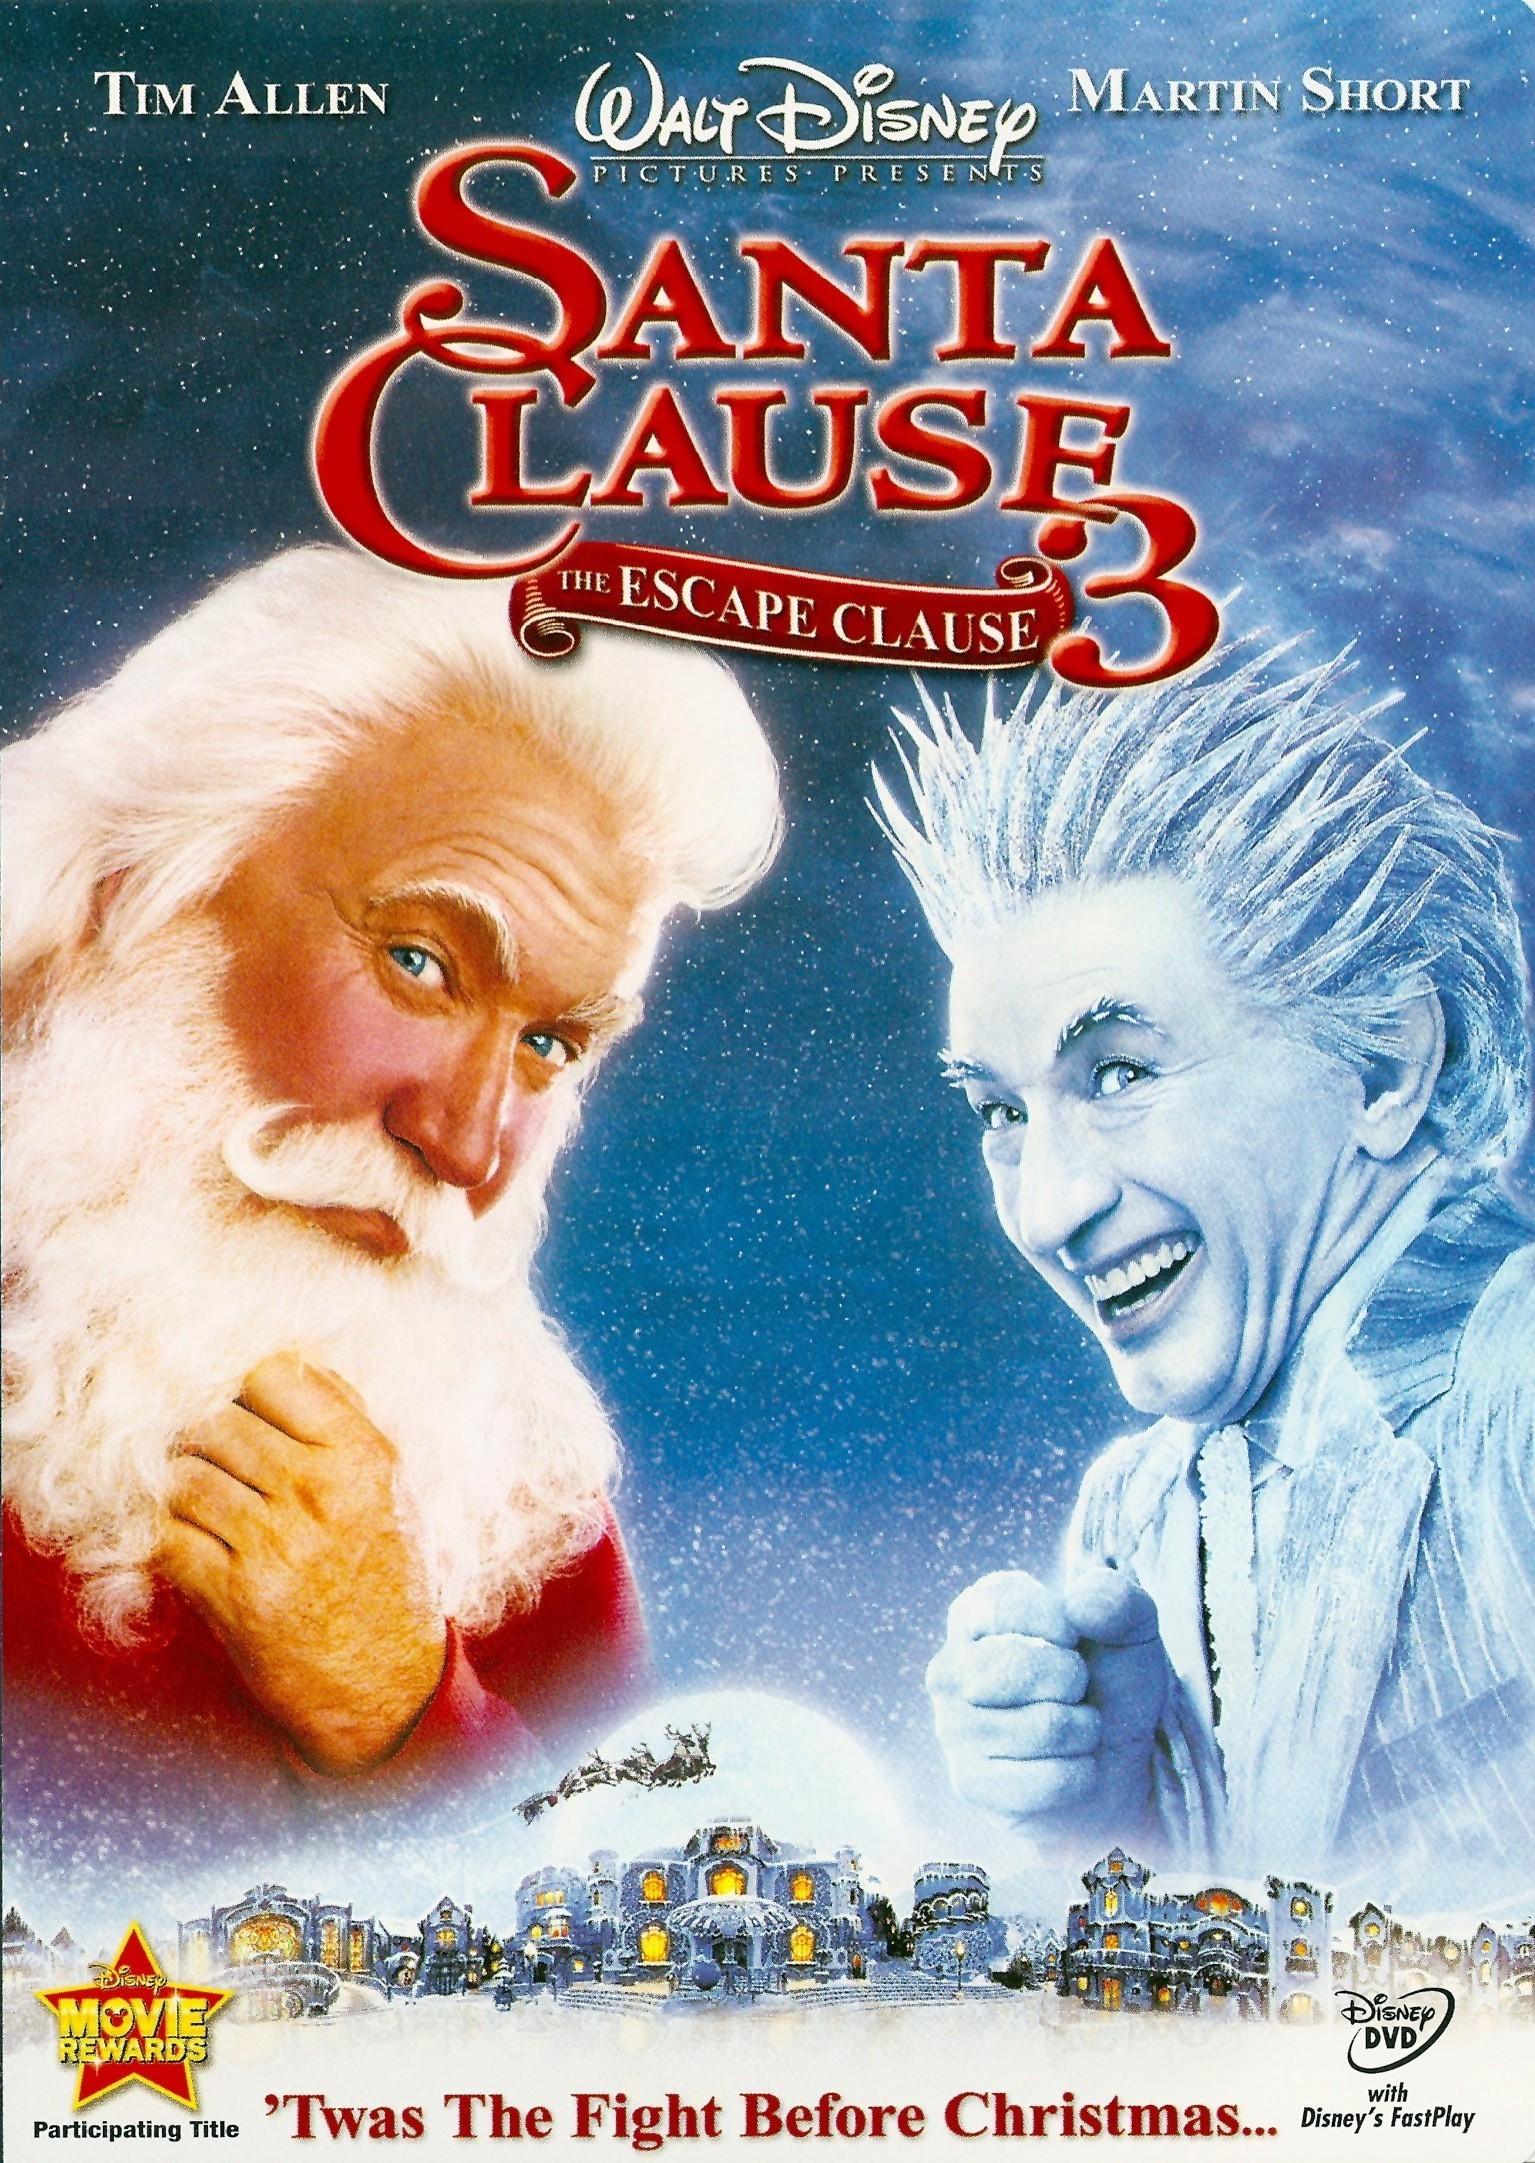 The Santa Clause 3: The Escape Clause (video)